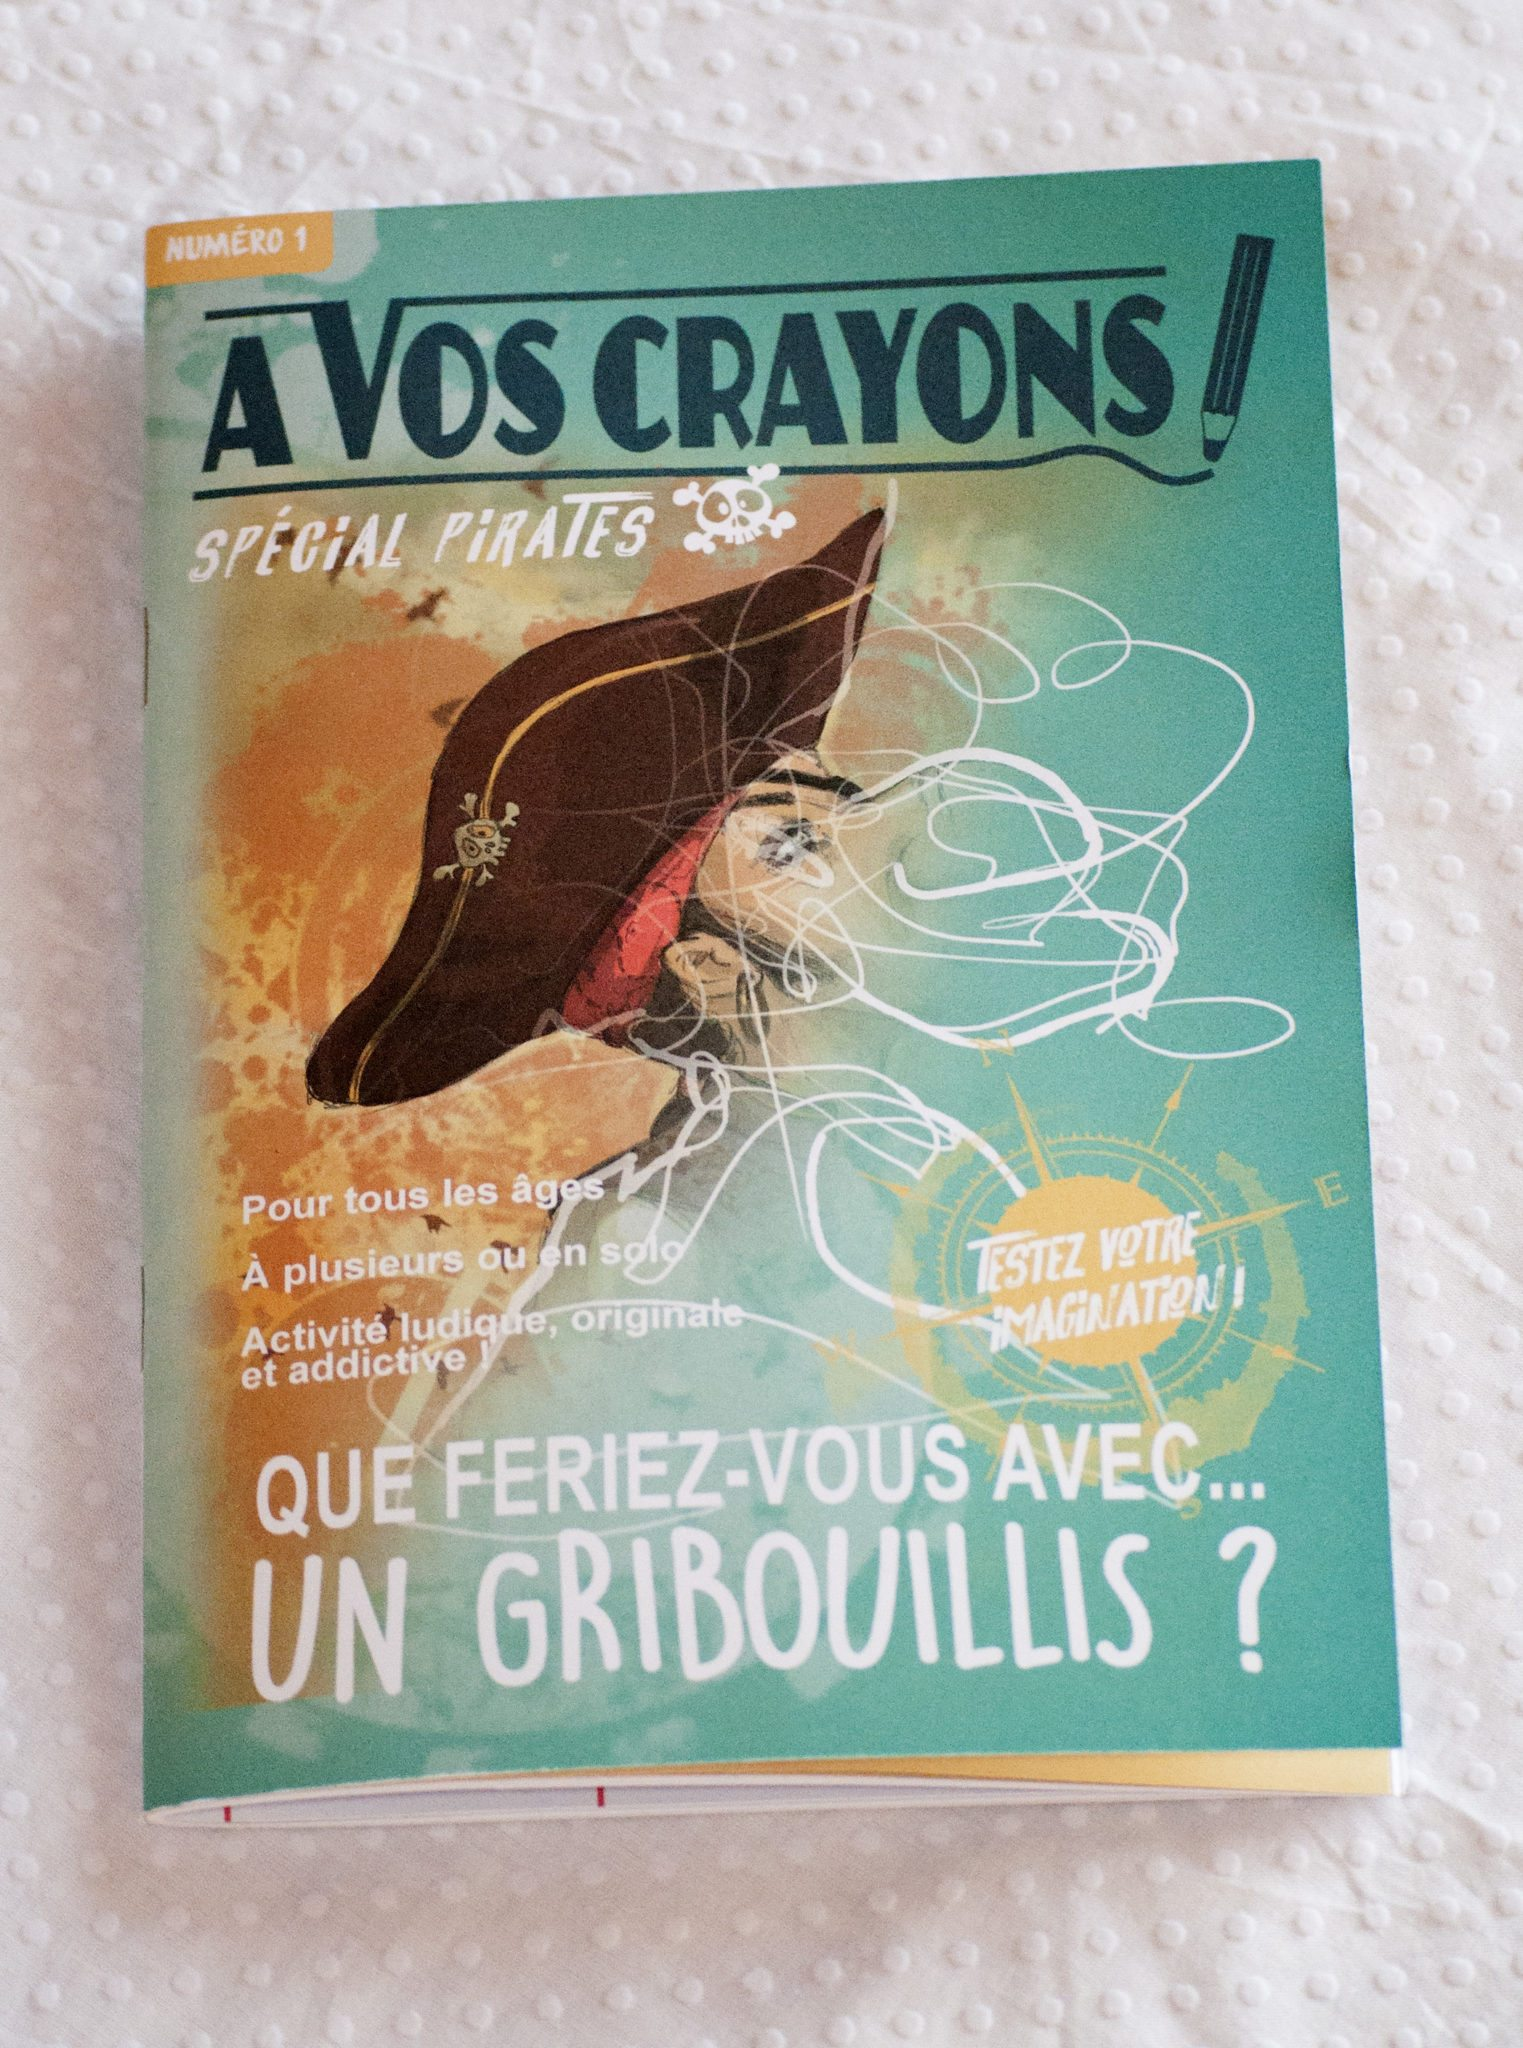 A vos crayons! Spécial Pirates